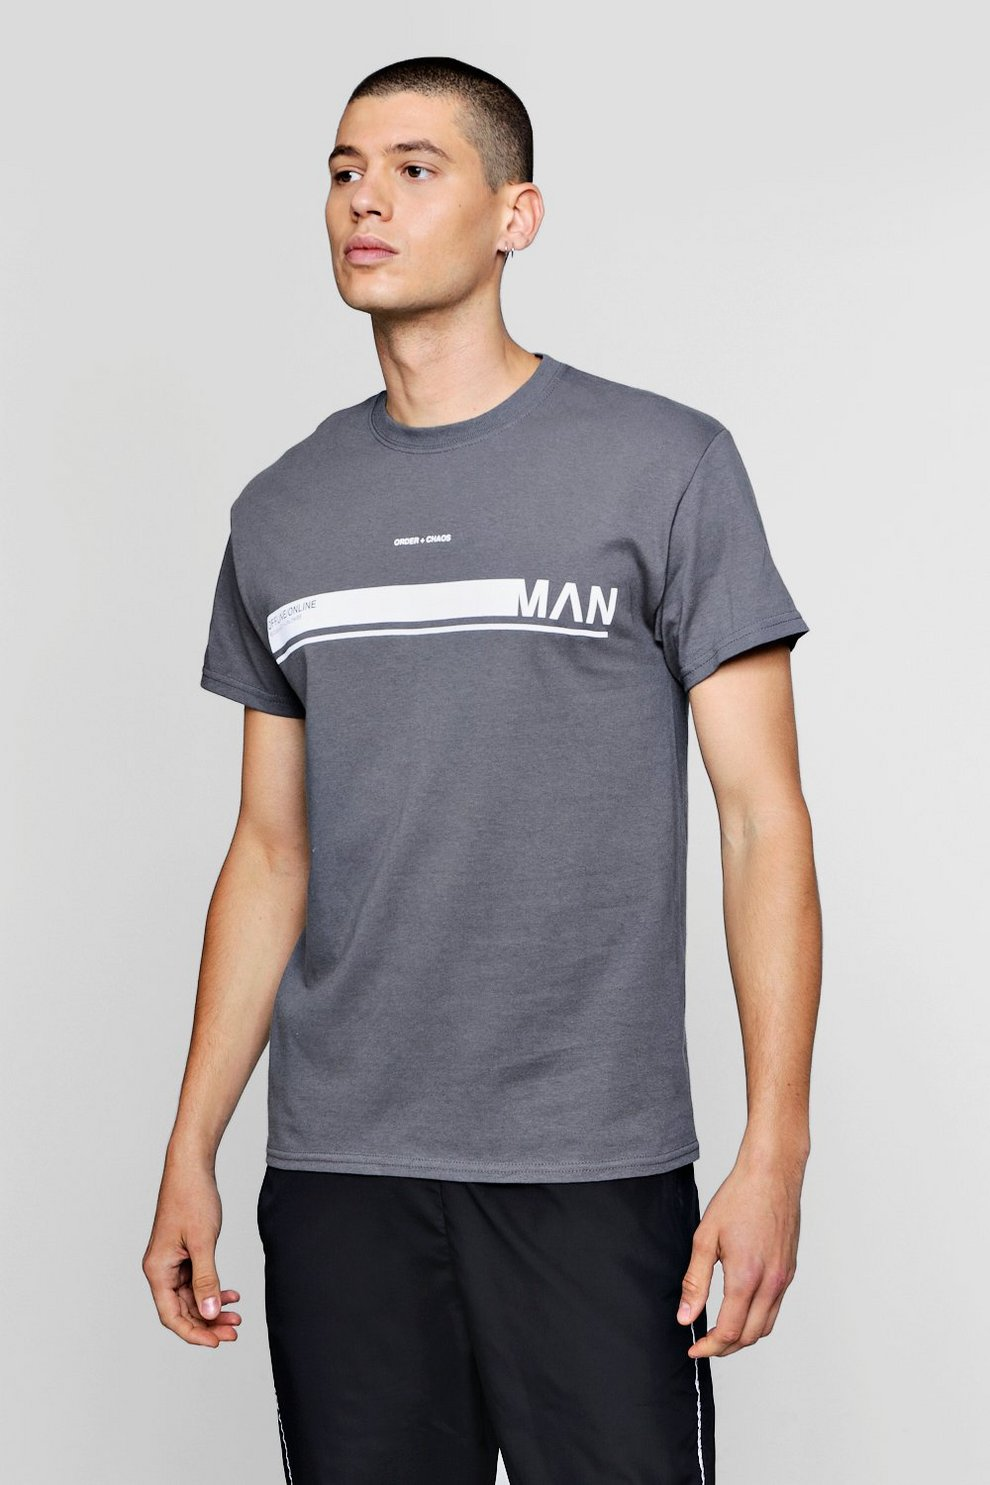 MAN Slogan T Shirt